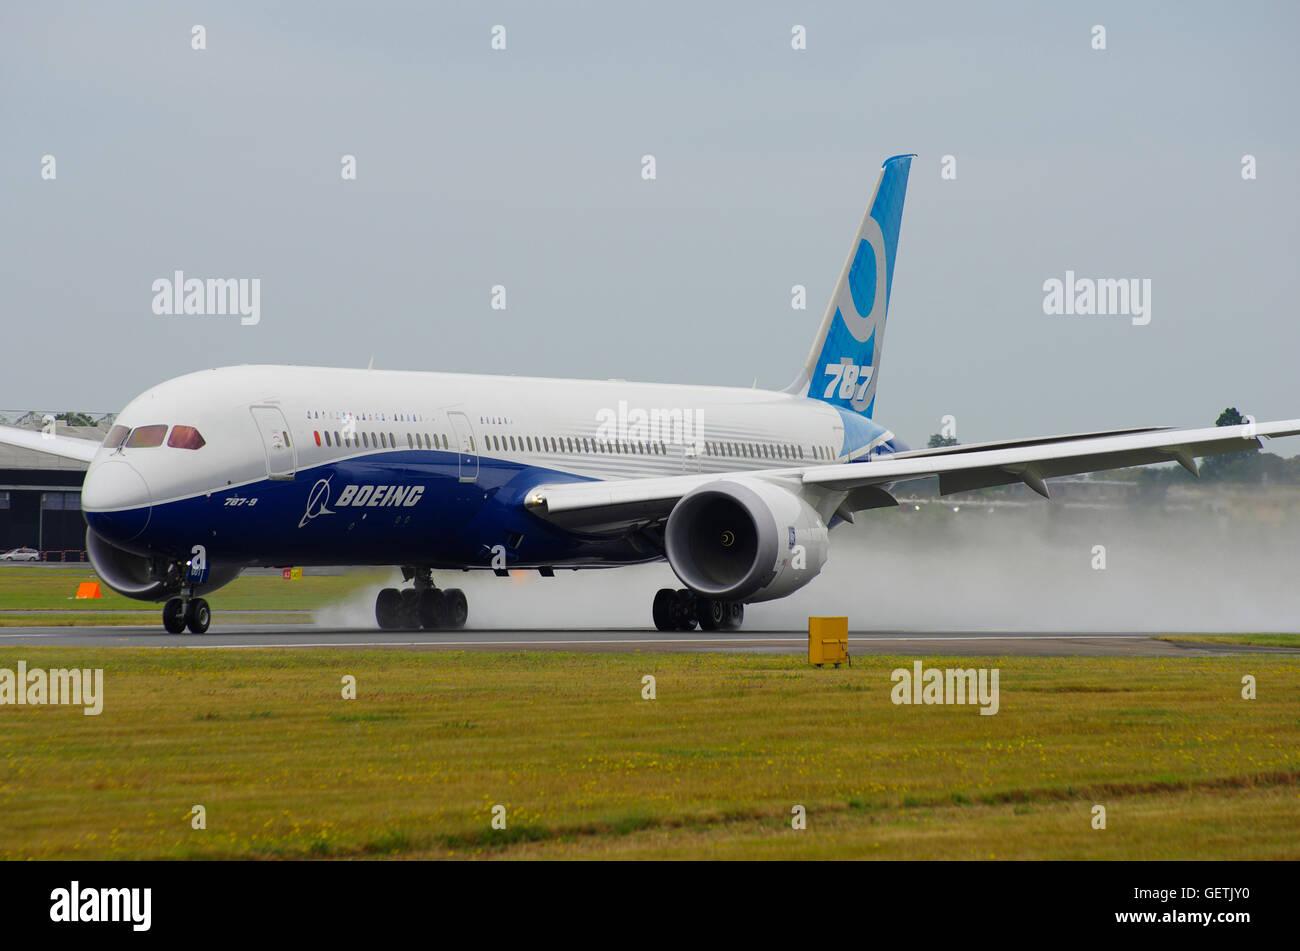 Boeng 787 at Farnborough 2014 - Stock Image